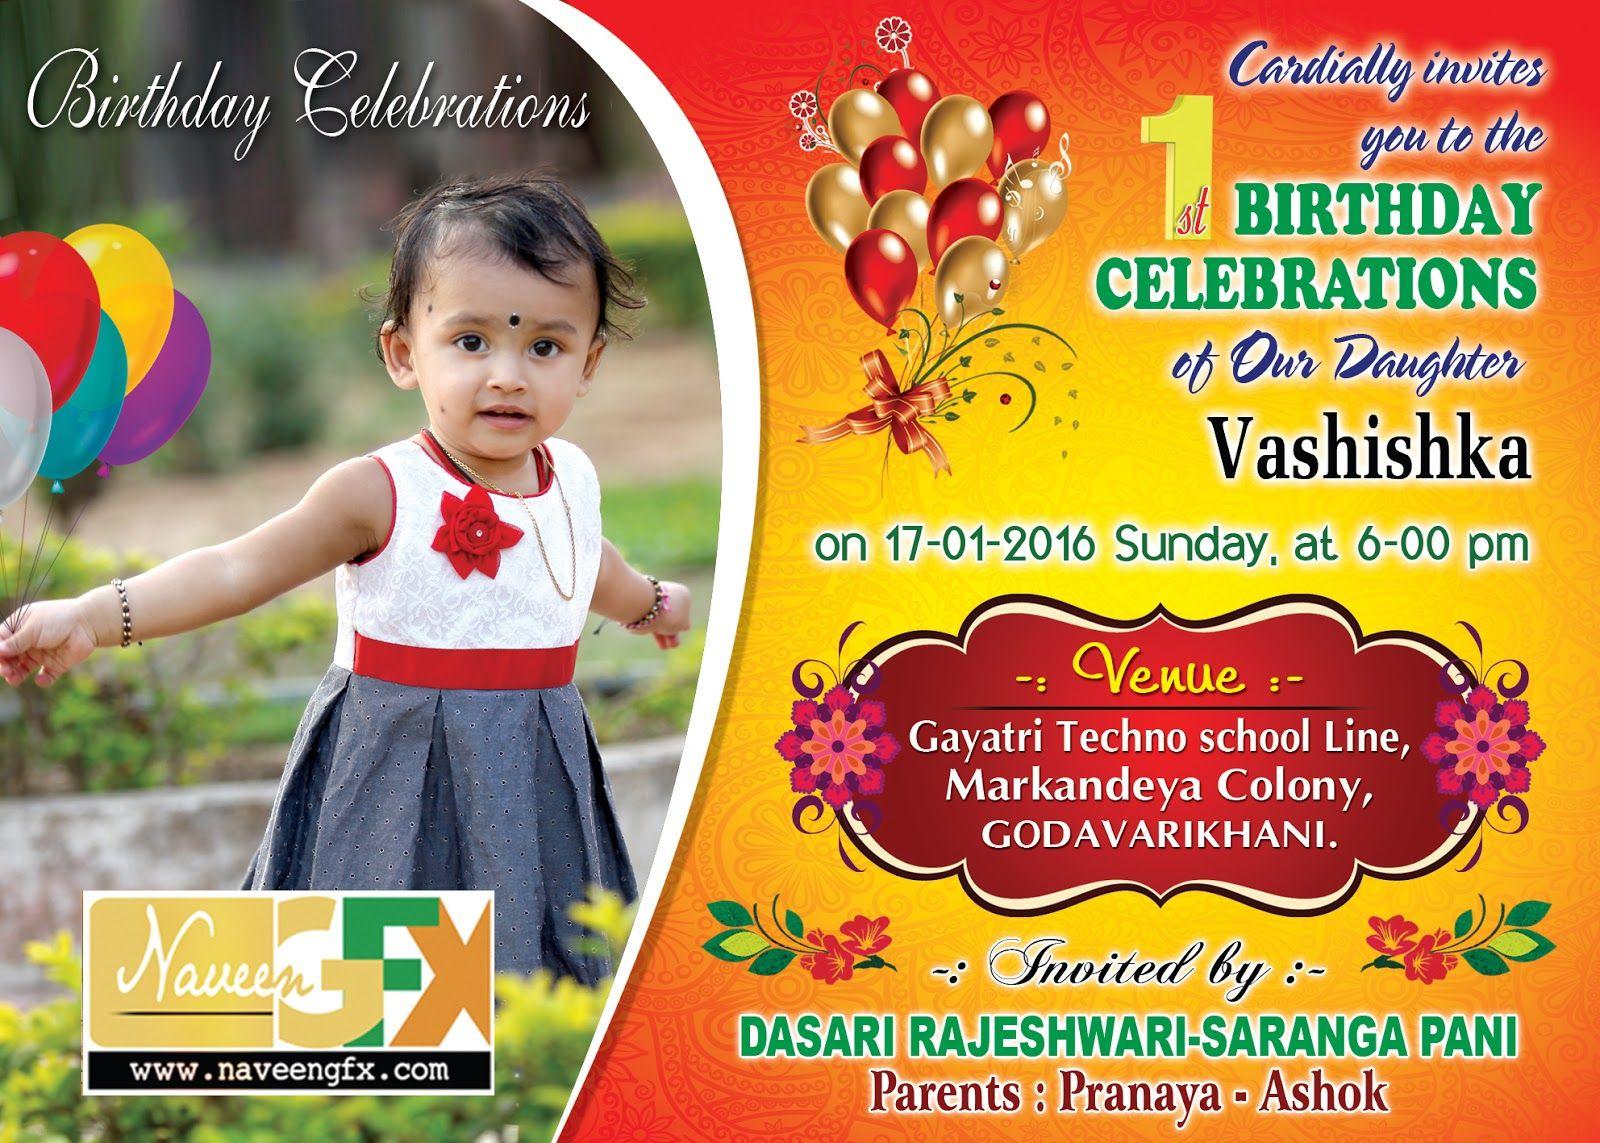 Sample Birthday Invitations Cards Psd Templates Free Downloads Naveengfx Create Birthday Invitations Happy Birthday Invitation Card Invitation Card Birthday